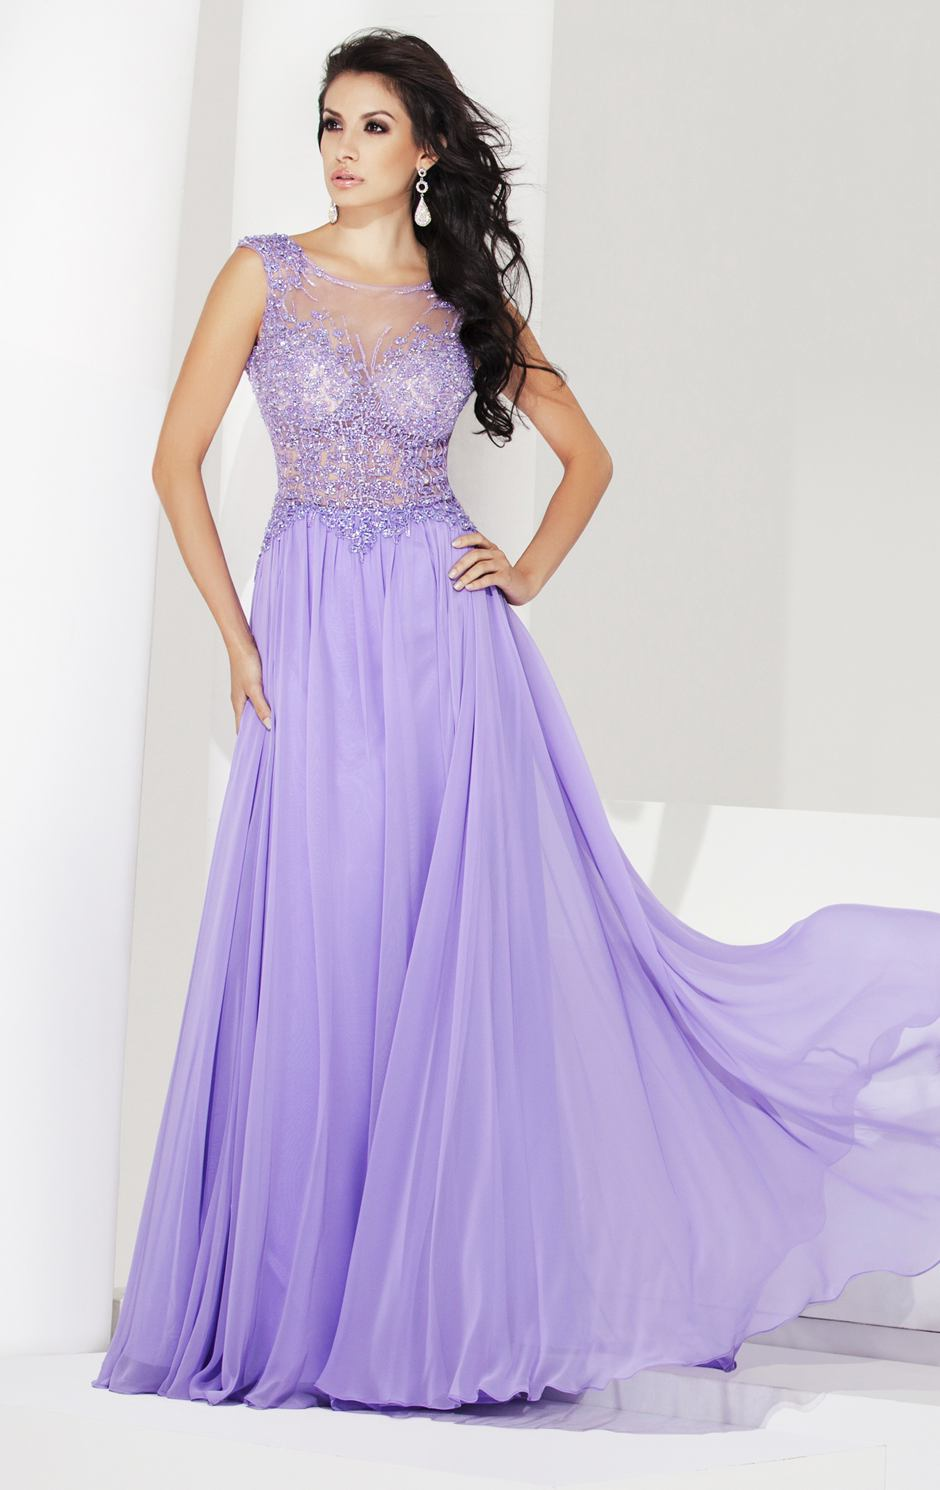 Evening Dresses - Prom Dress - Cocktail Dress | Shahani Couture